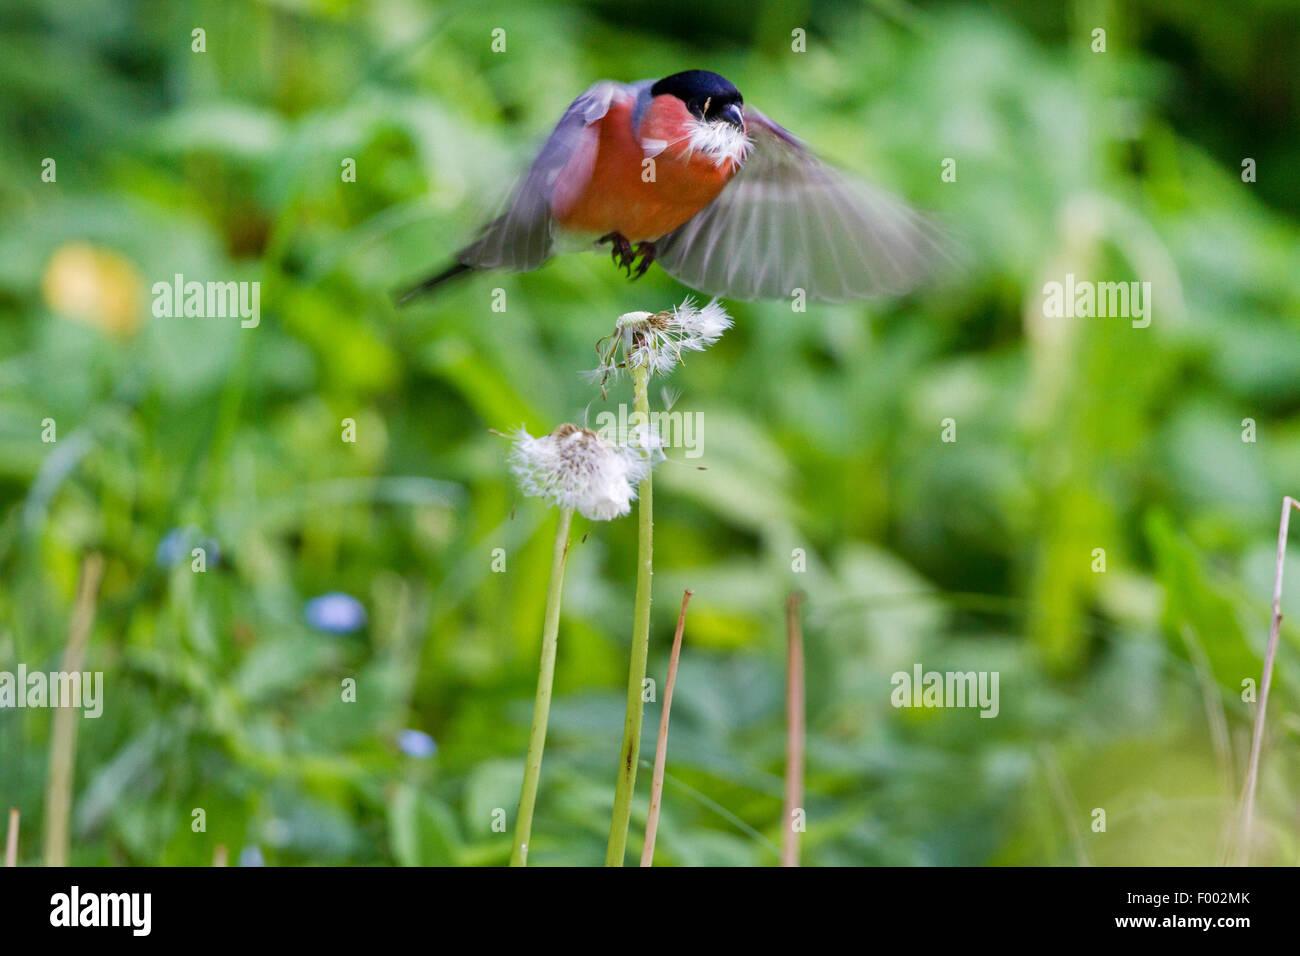 bullfinch, Eurasian bullfinch, northern bullfinch (Pyrrhula pyrrhula), male with seeds of dandelion in its bill, - Stock Image